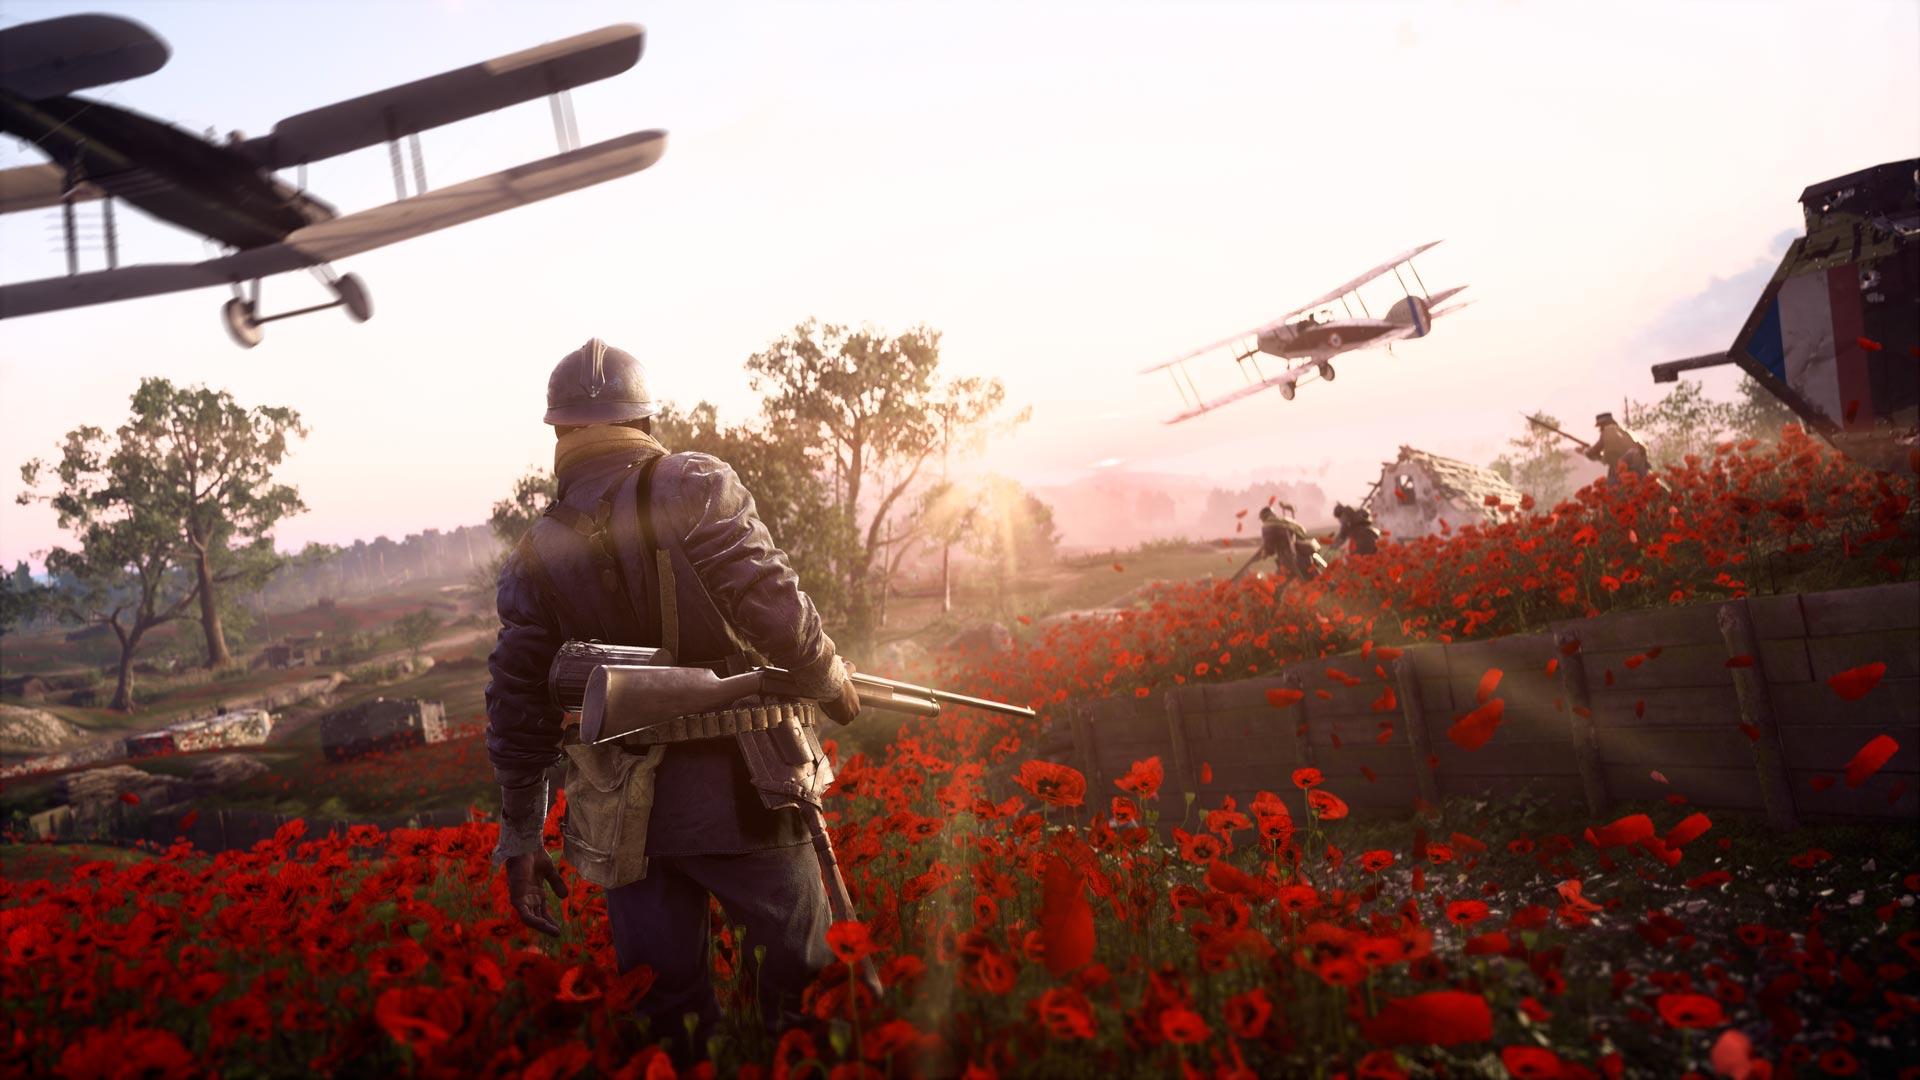 https://media-www-battlefieldwebcore.spark.ea.com/content/battlefield-portal/fr_FR/games/battlefield-1/they-shall-not-pass/_jcr_content/par/section_6/columns/column/content/editorial/image/large.img.jpg